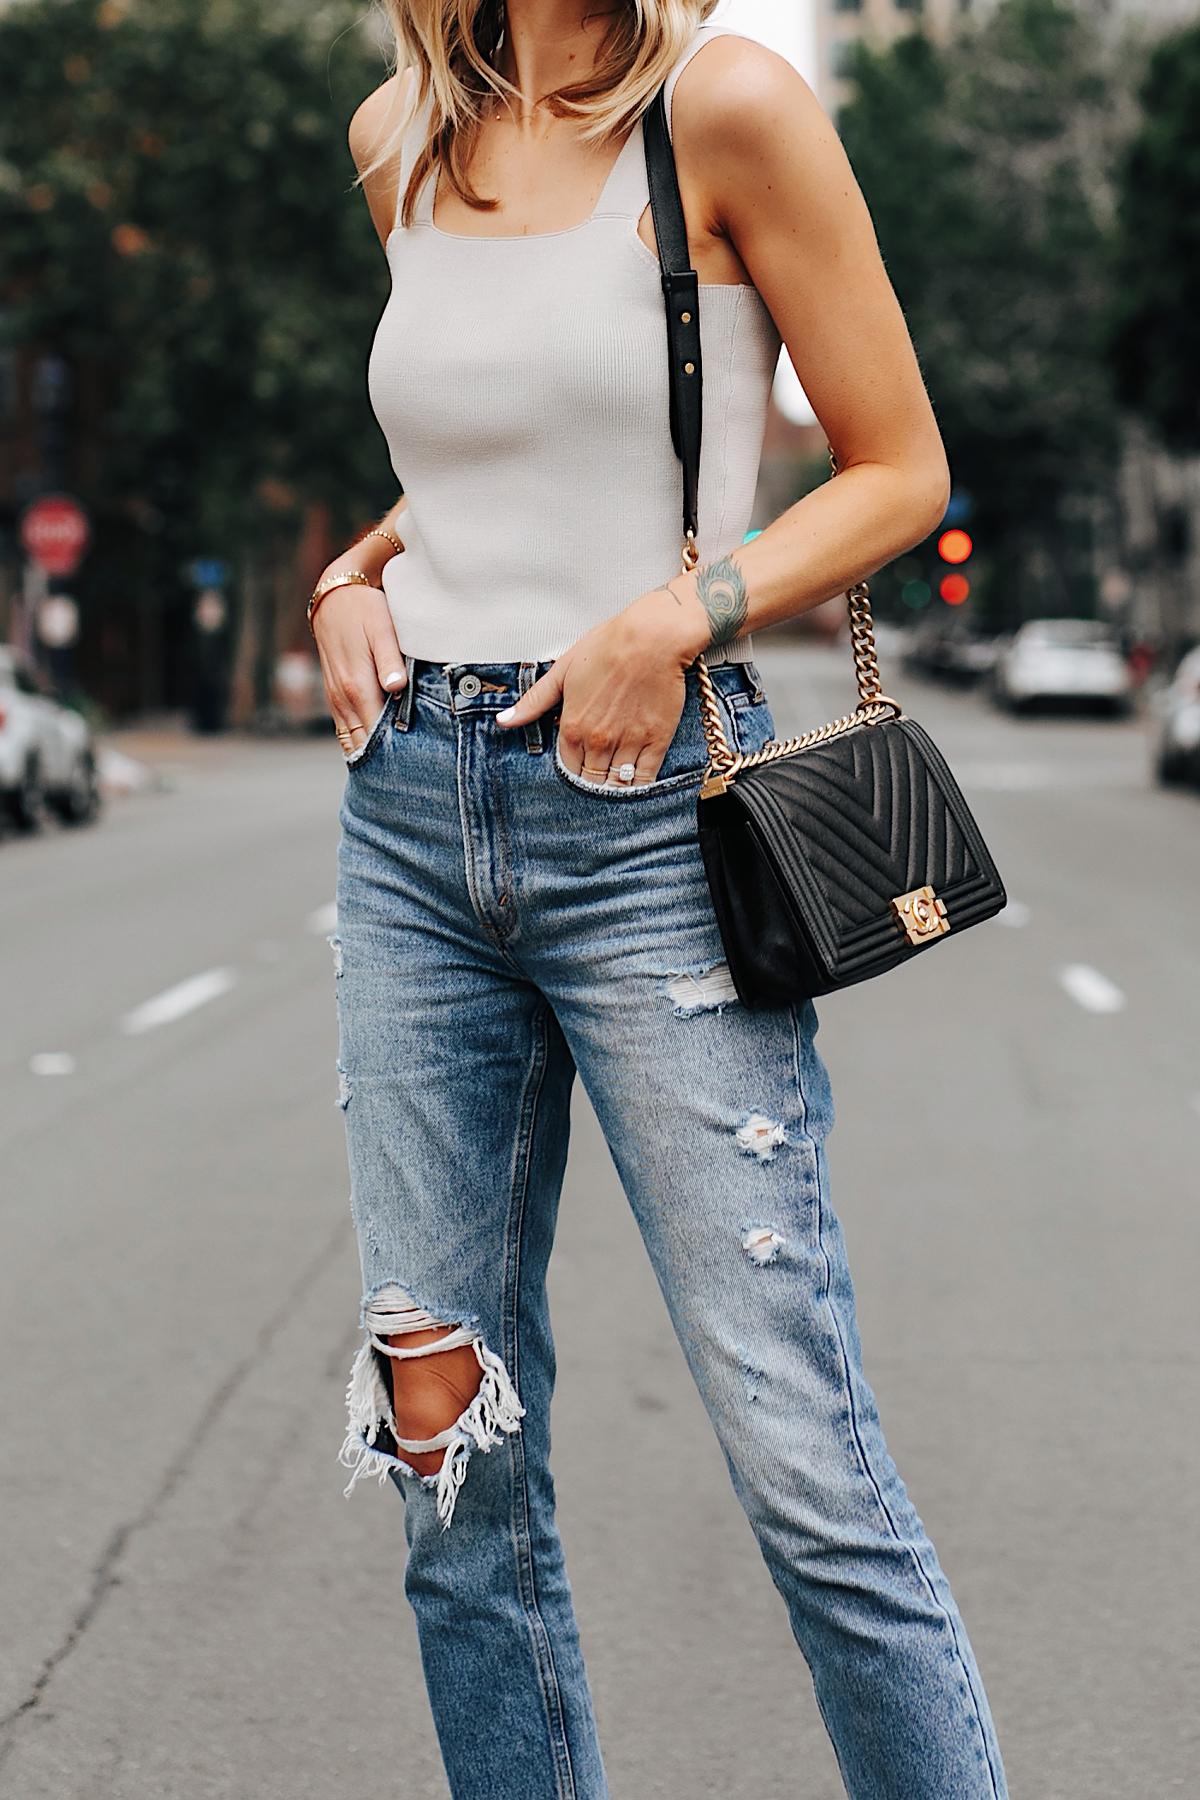 Fashion Jackson Wearing Beige Knit Tank Abercrombie Ripped Mom Jeans Chanel Black Boy Bag